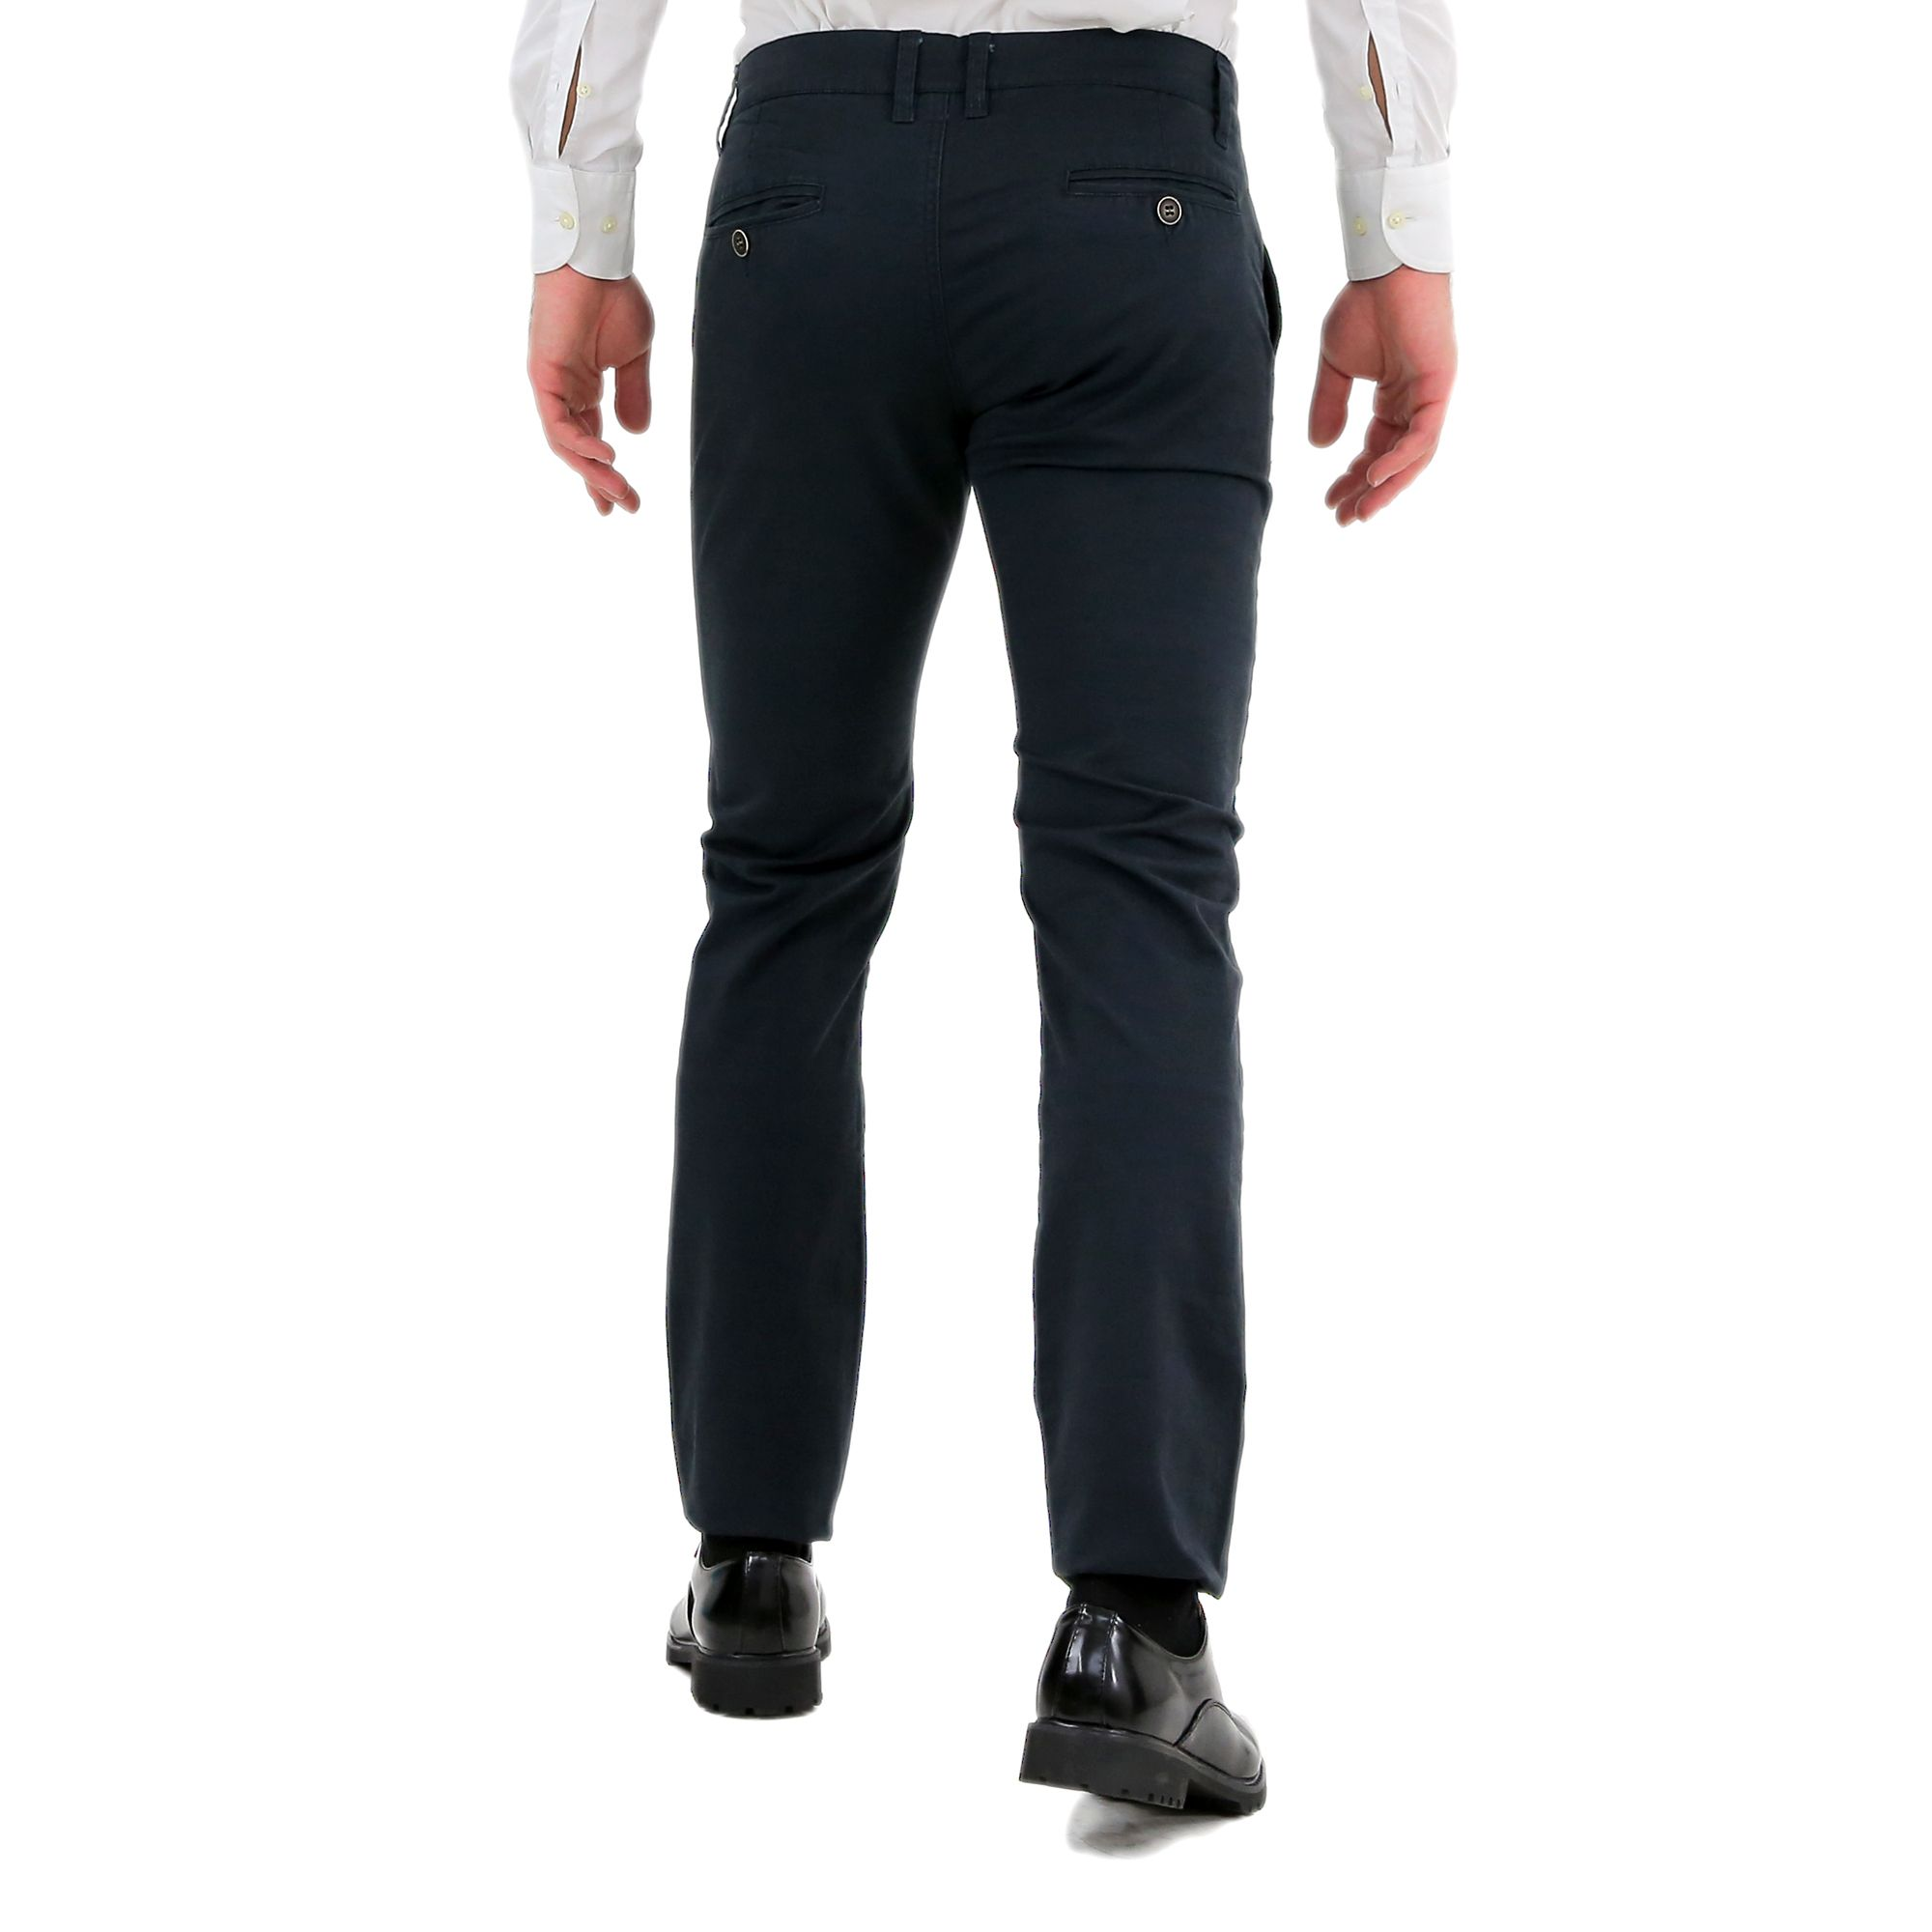 Pantaloni-Uomo-Slim-Fit-Eleganti-Invernali-Cargo-Classico-Chino-Kaki-Tasca-Ameri miniatura 4